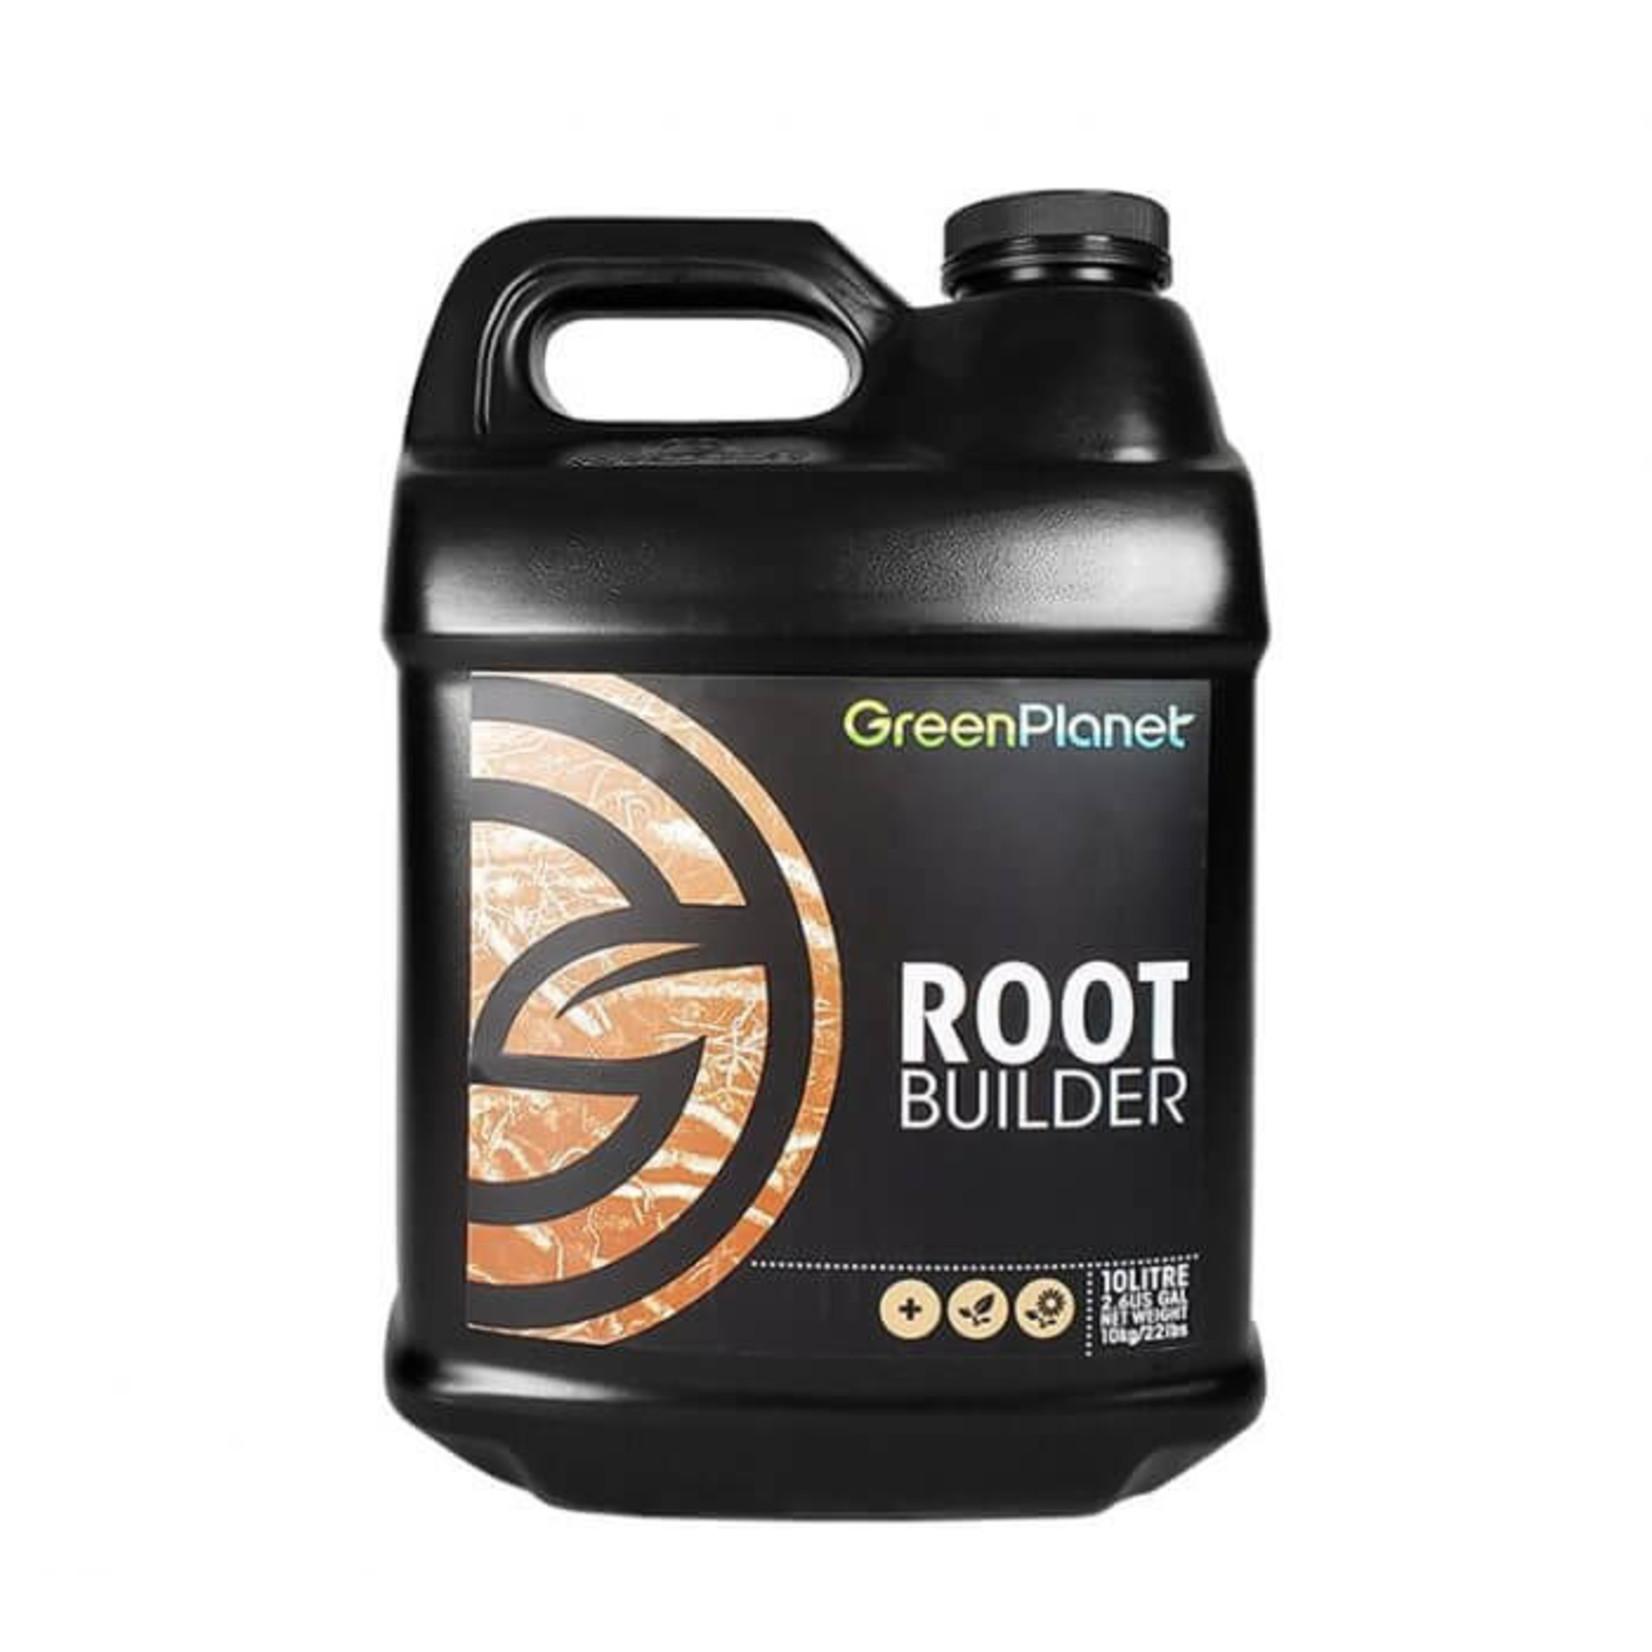 Green Planet GreenPlanet Nutrients Root Builder